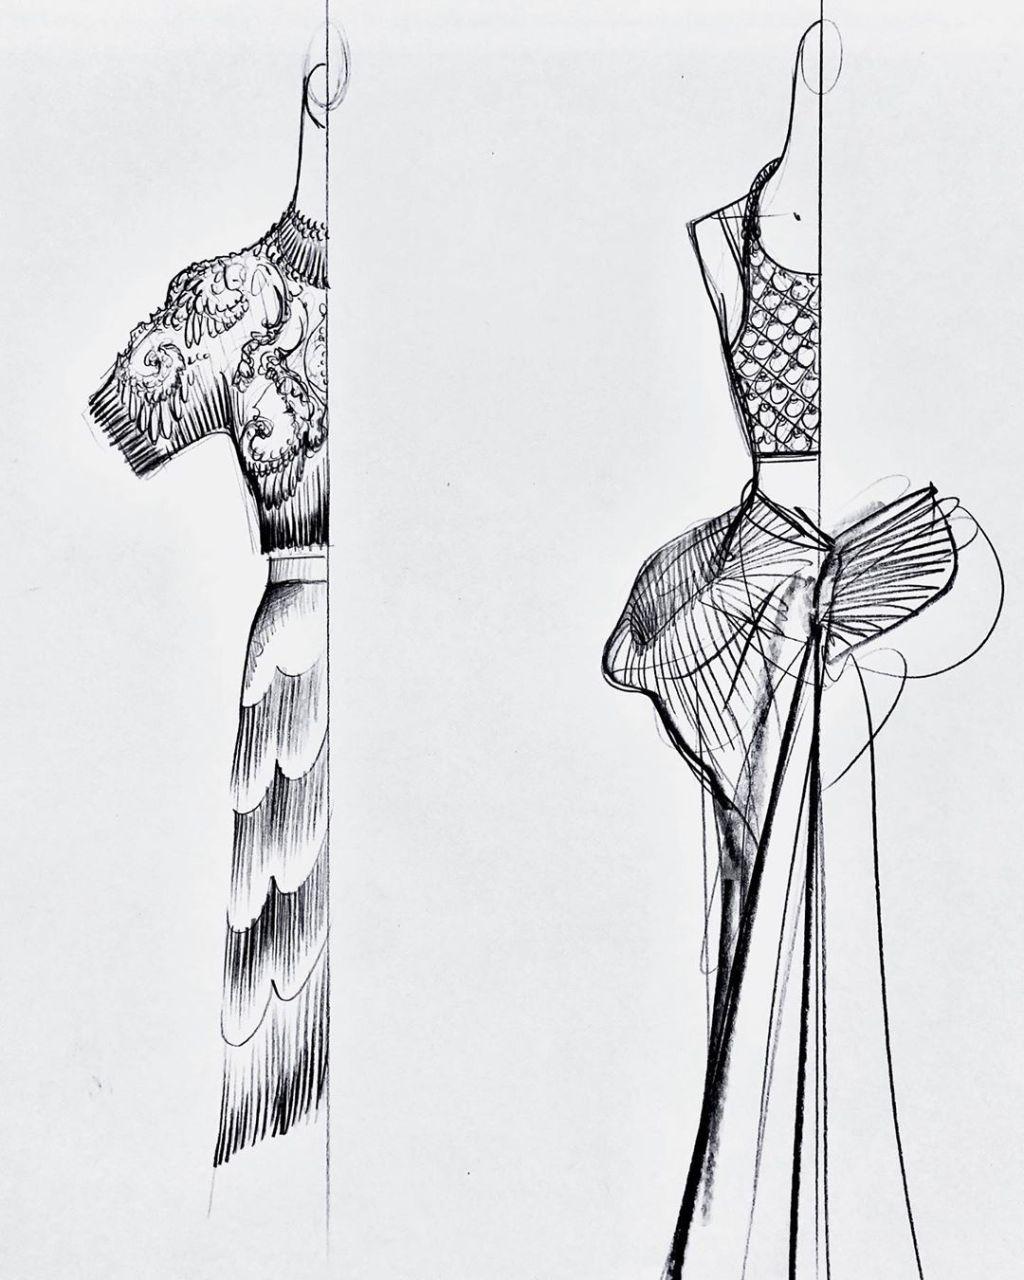 Sketches by Daniel Roseberry for Schiaparelli